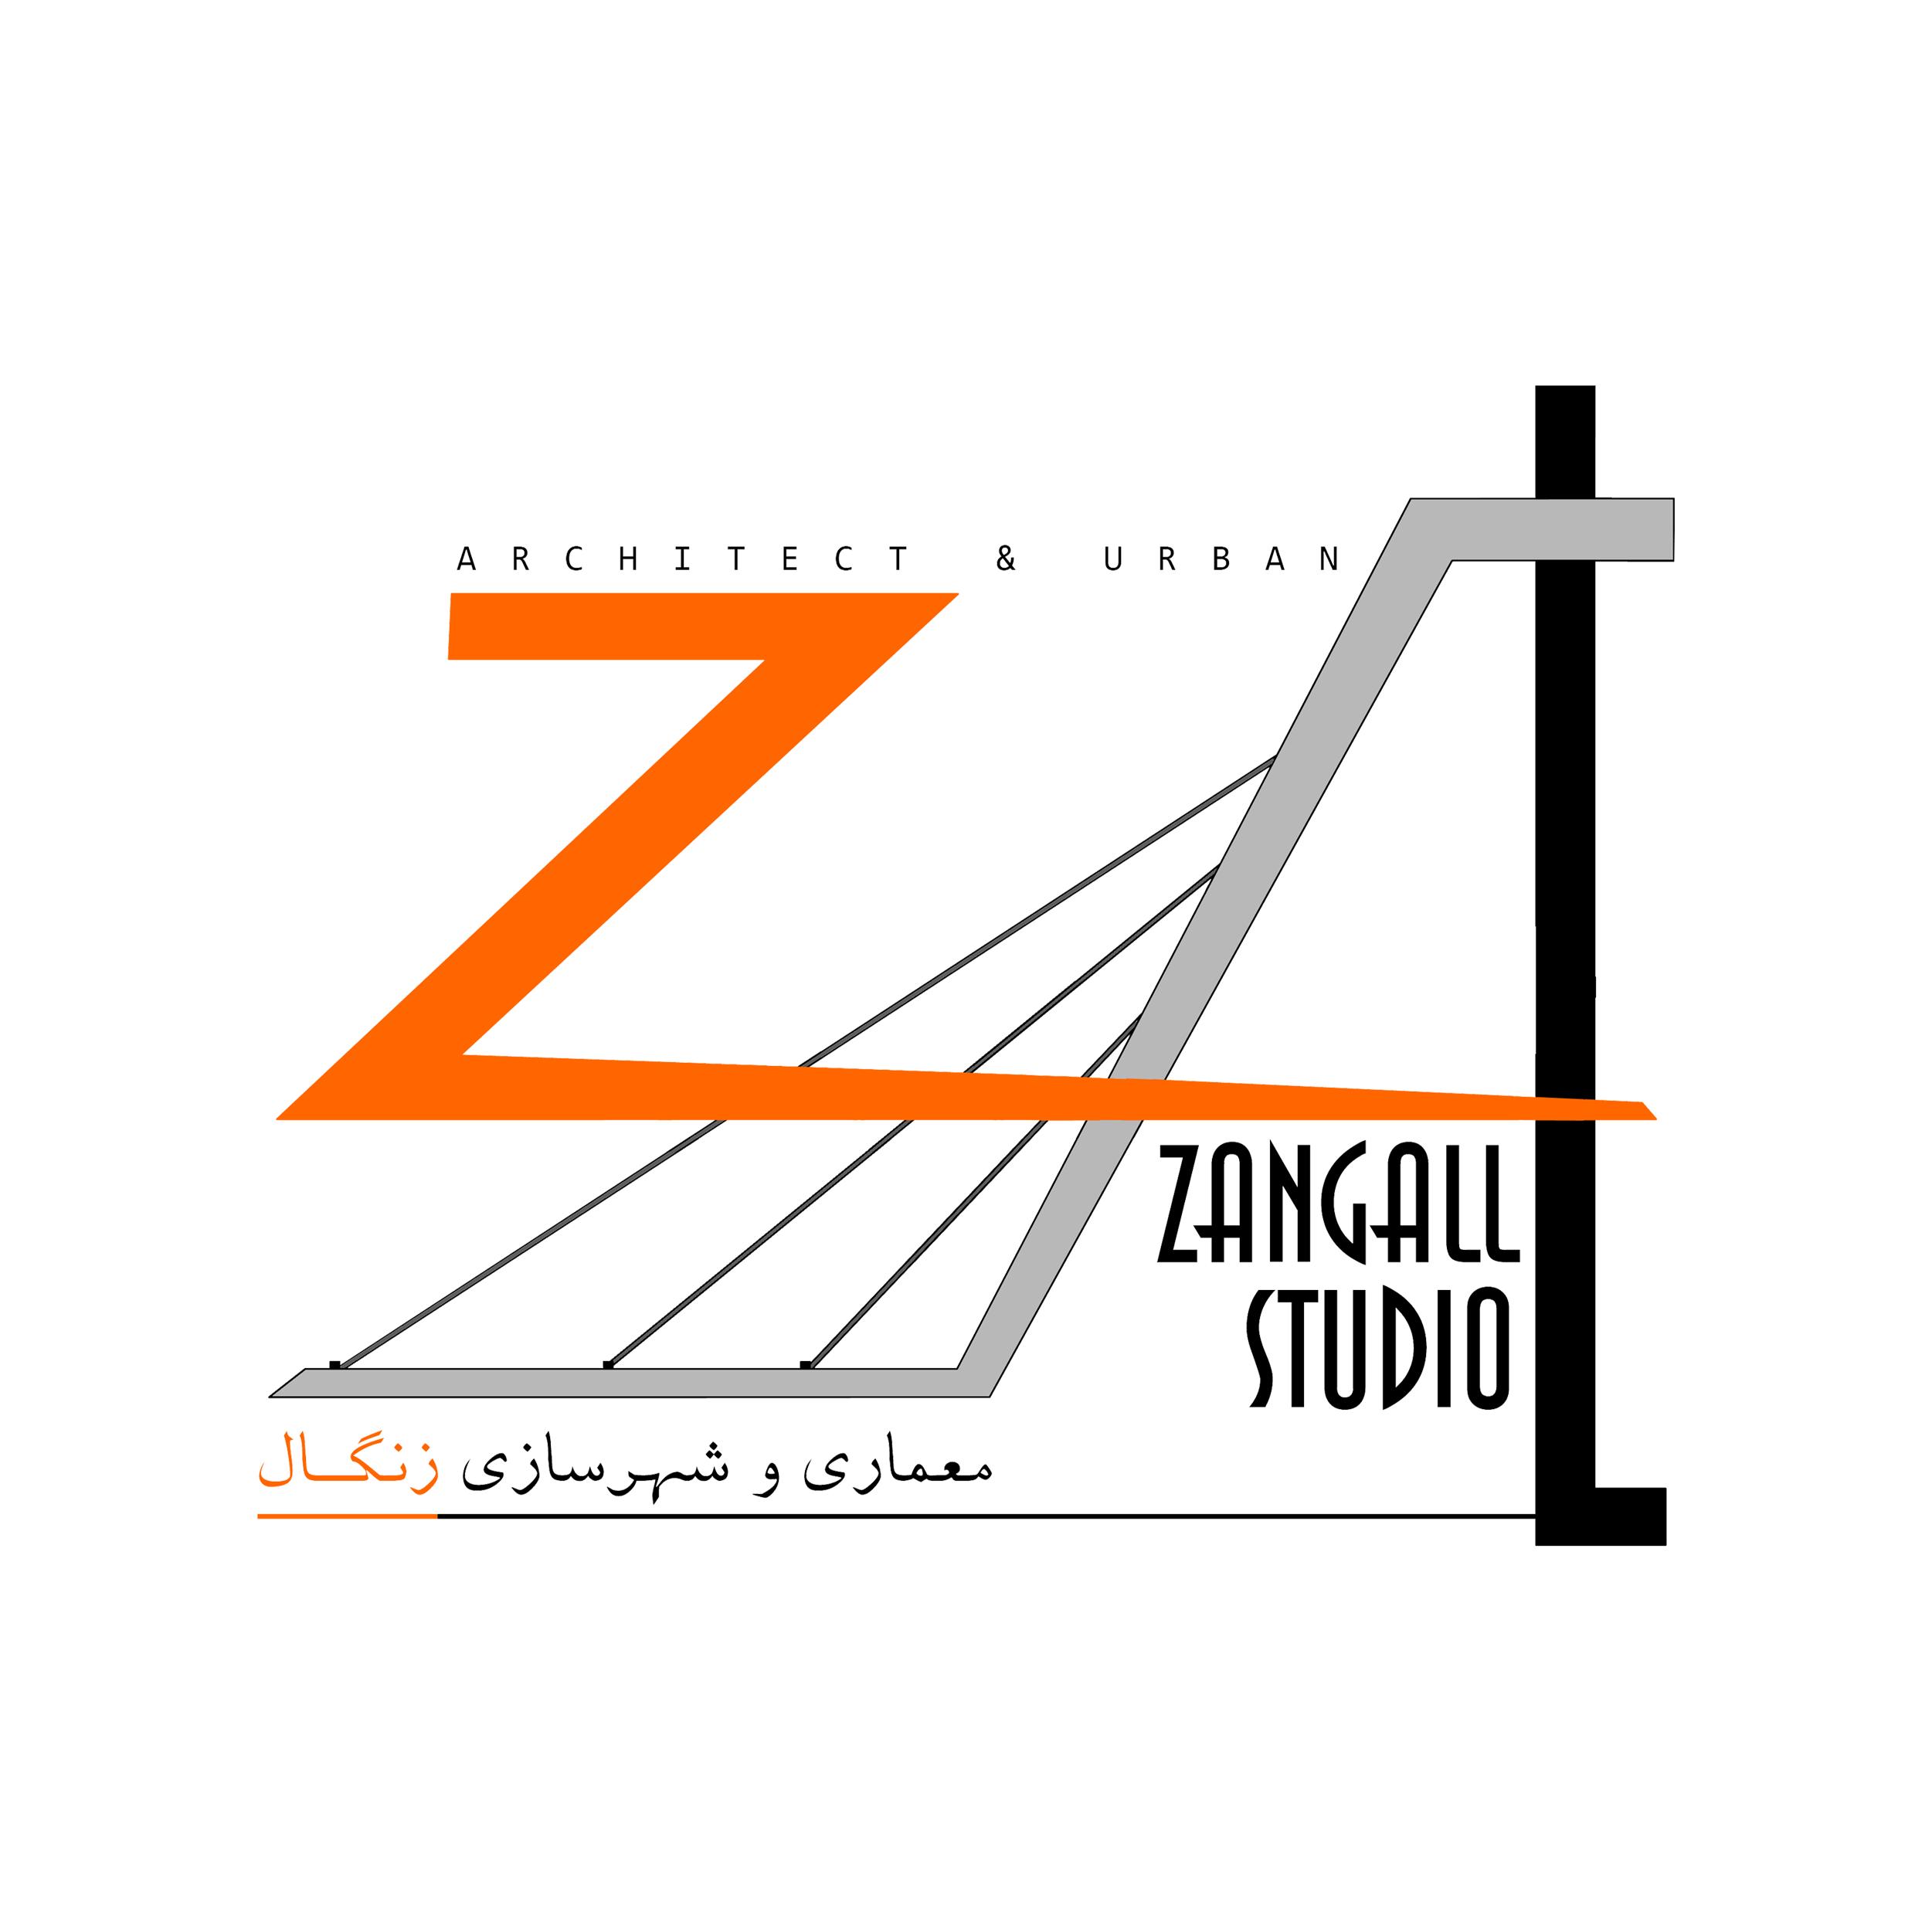 زنگال/Zangall